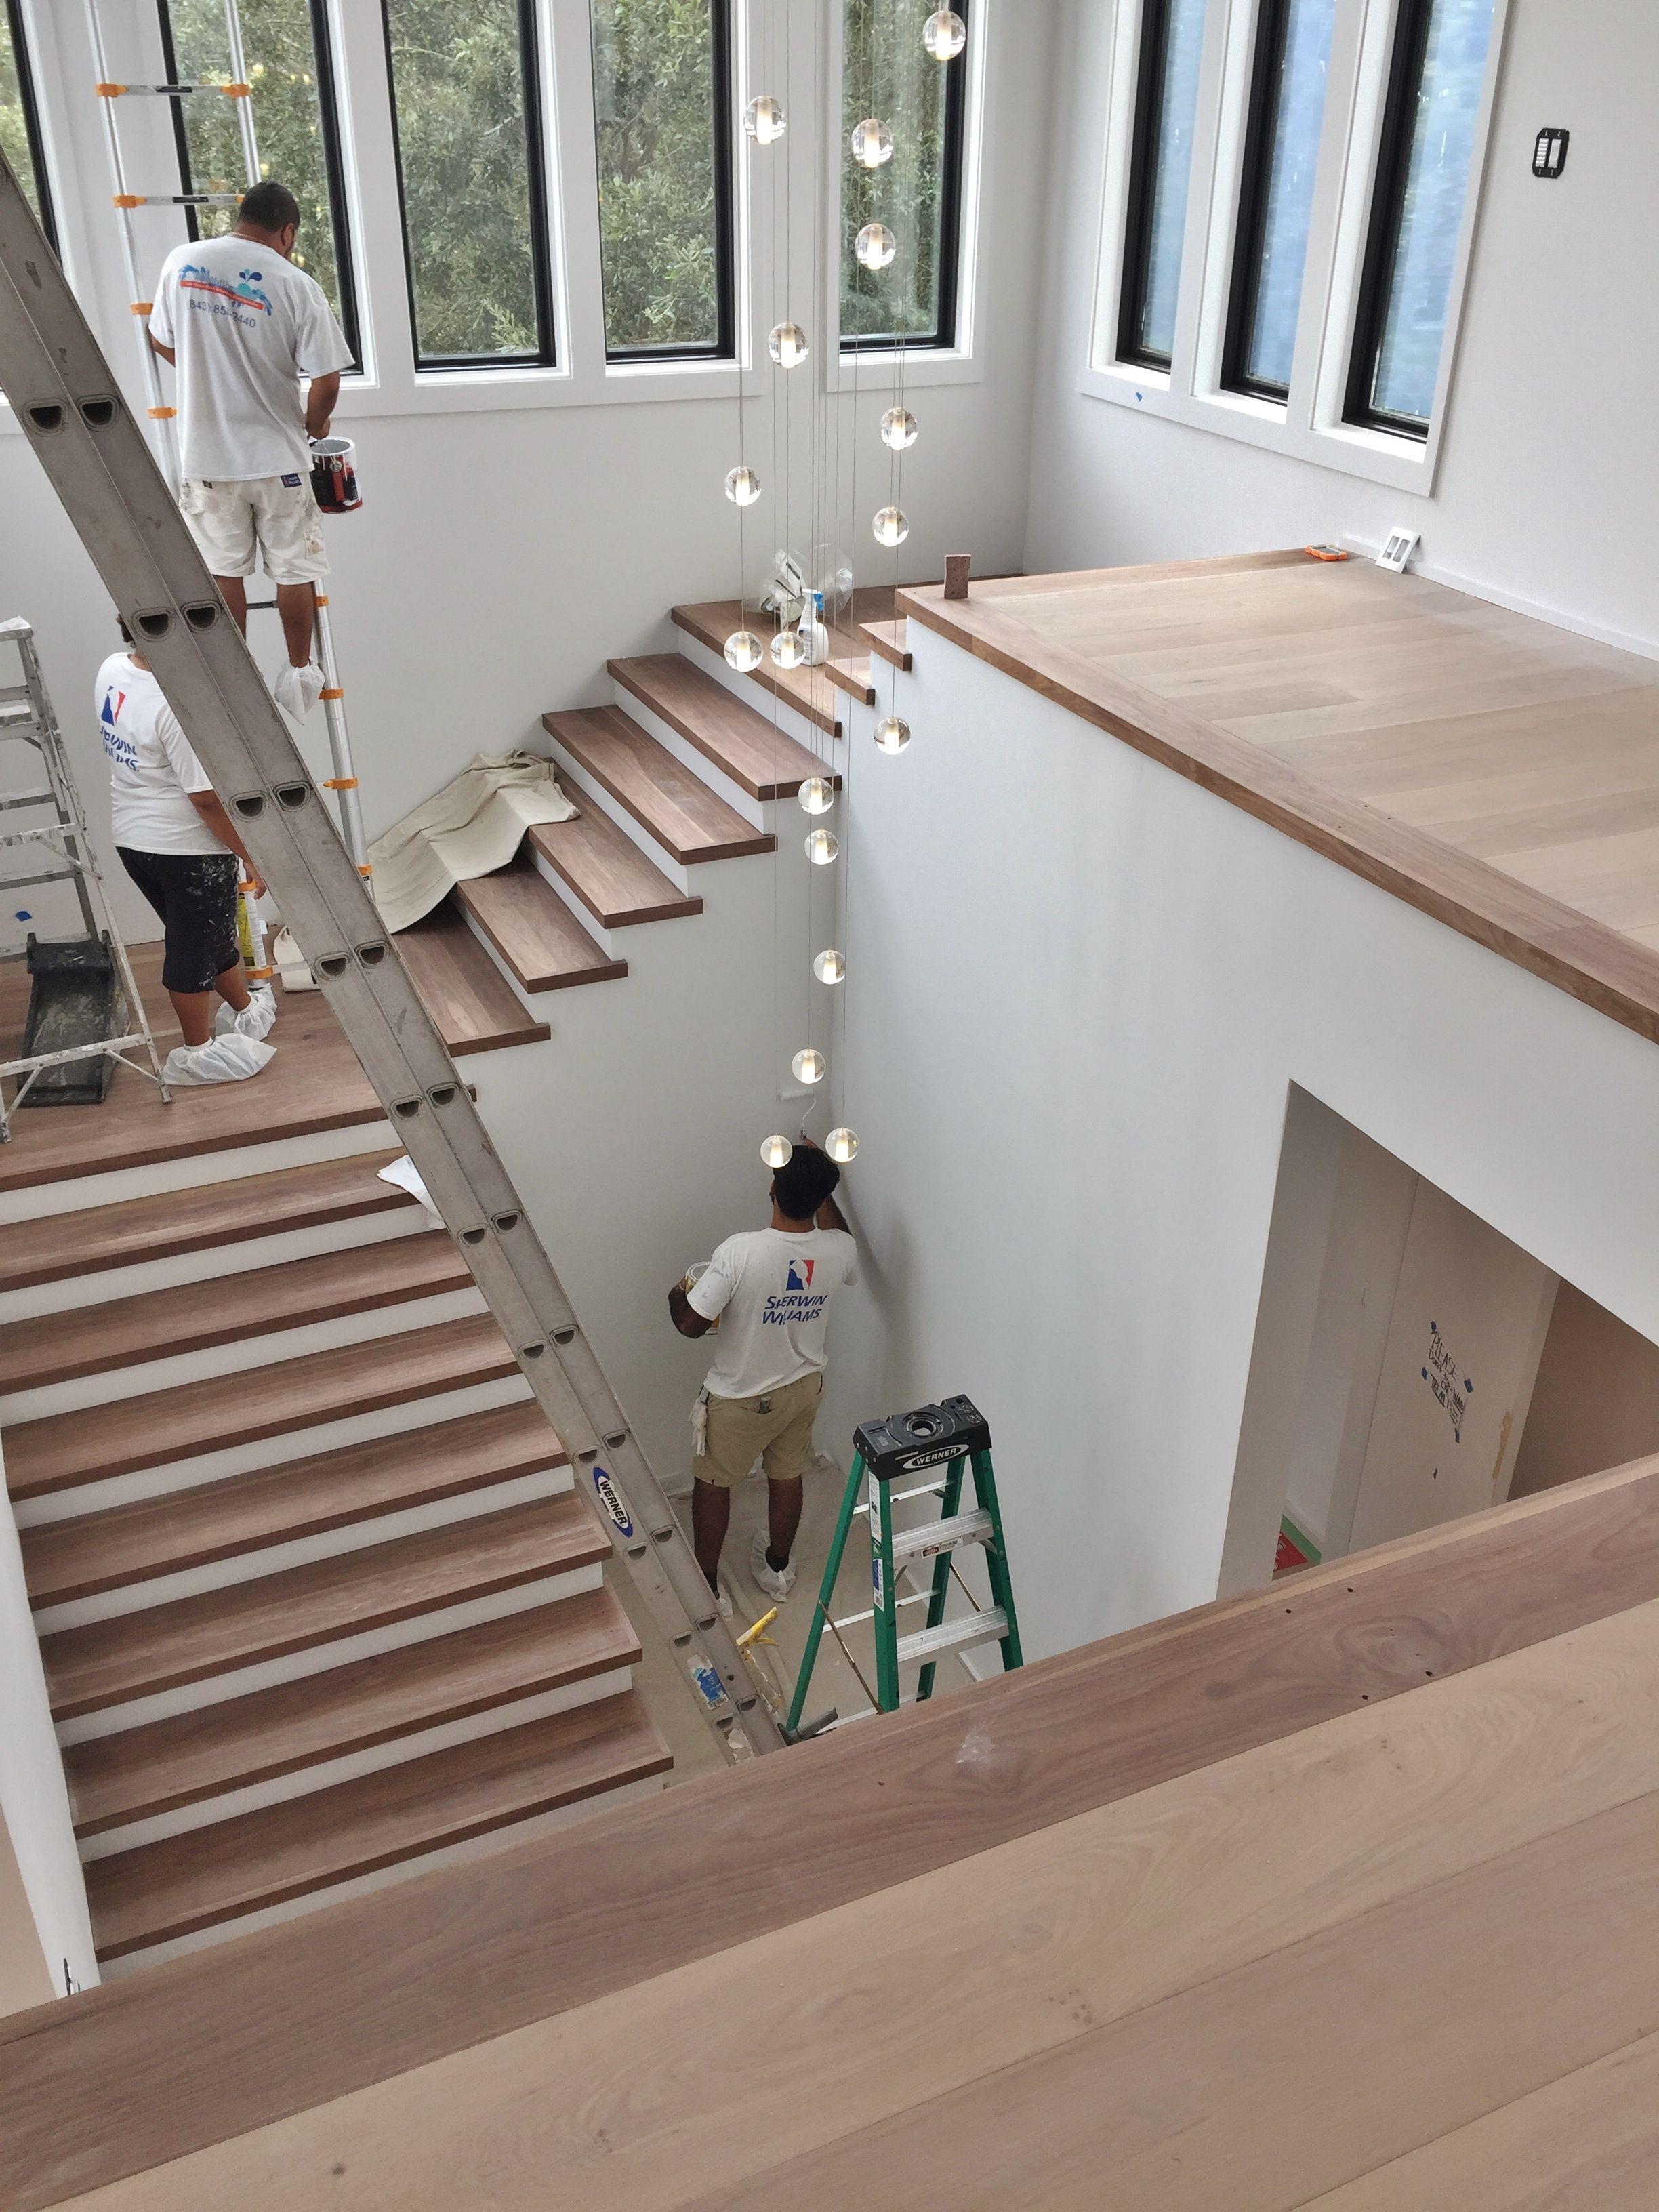 Engineered White Oak With Red Oak Stair Treads And Border Nosing | Engineered Oak Stair Treads | Stair Nosing | Wood | Modern Retro | Laminate Flooring | Stair Parts